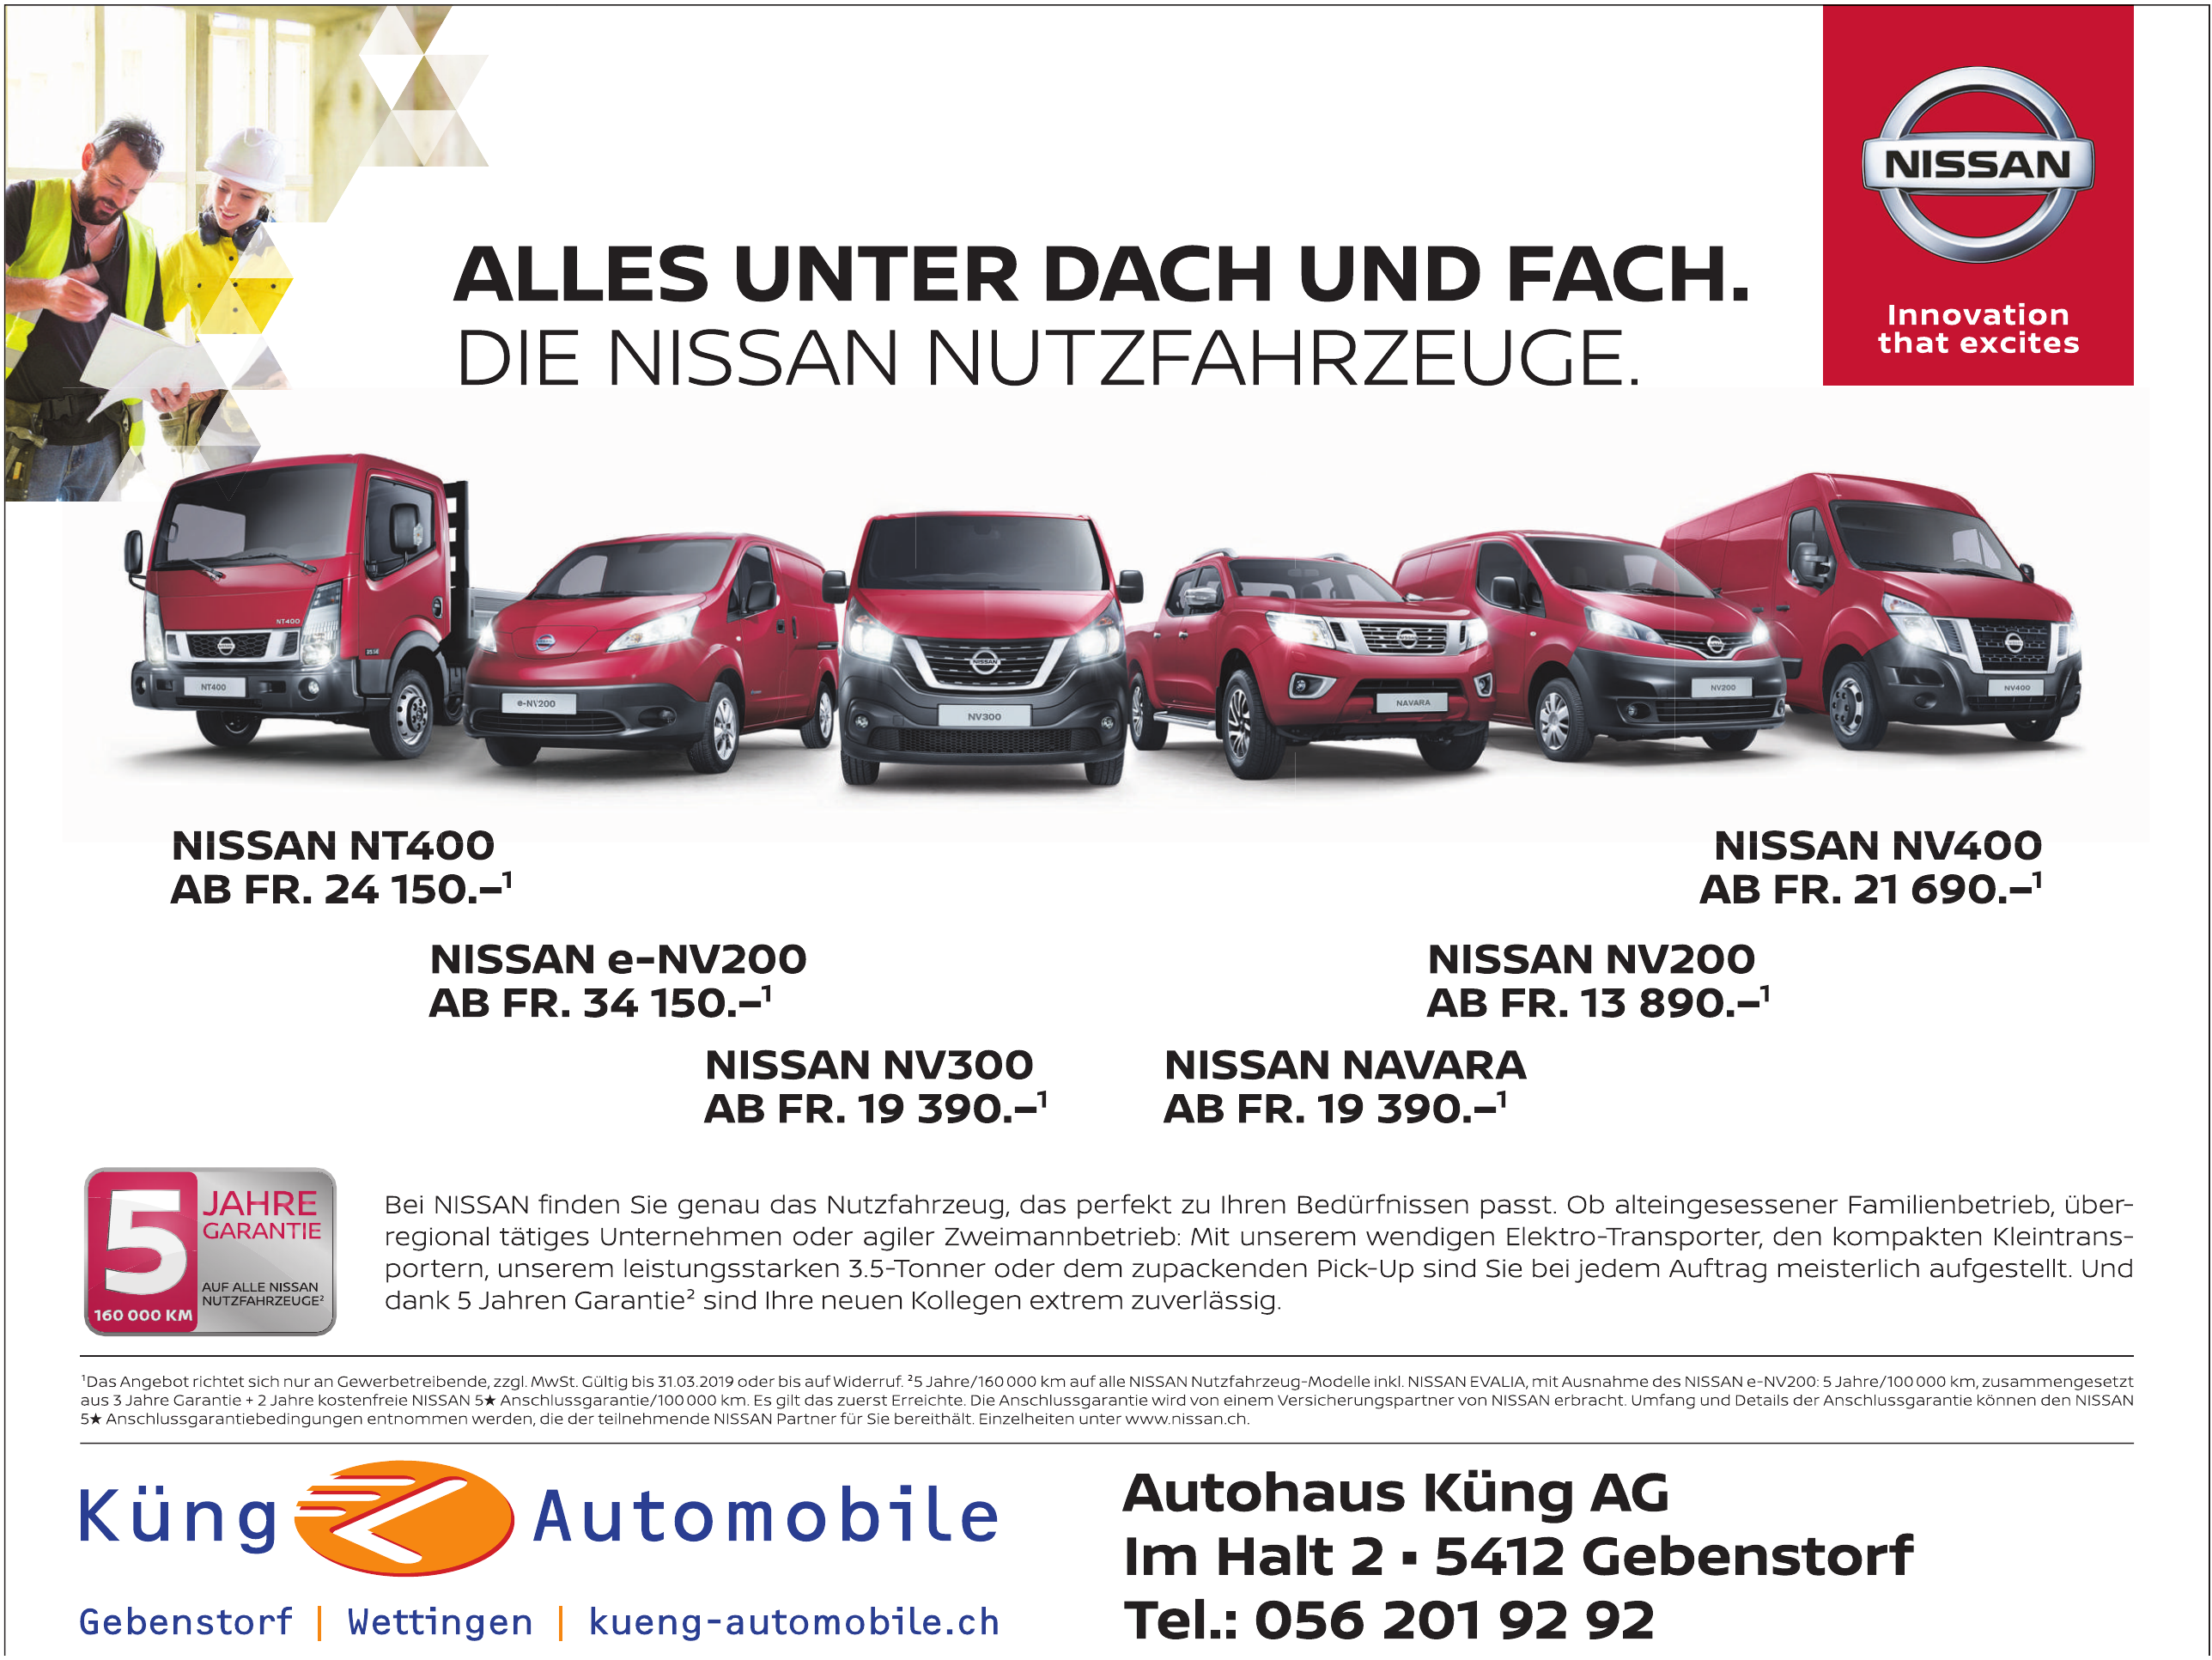 Autohaus Küng AG